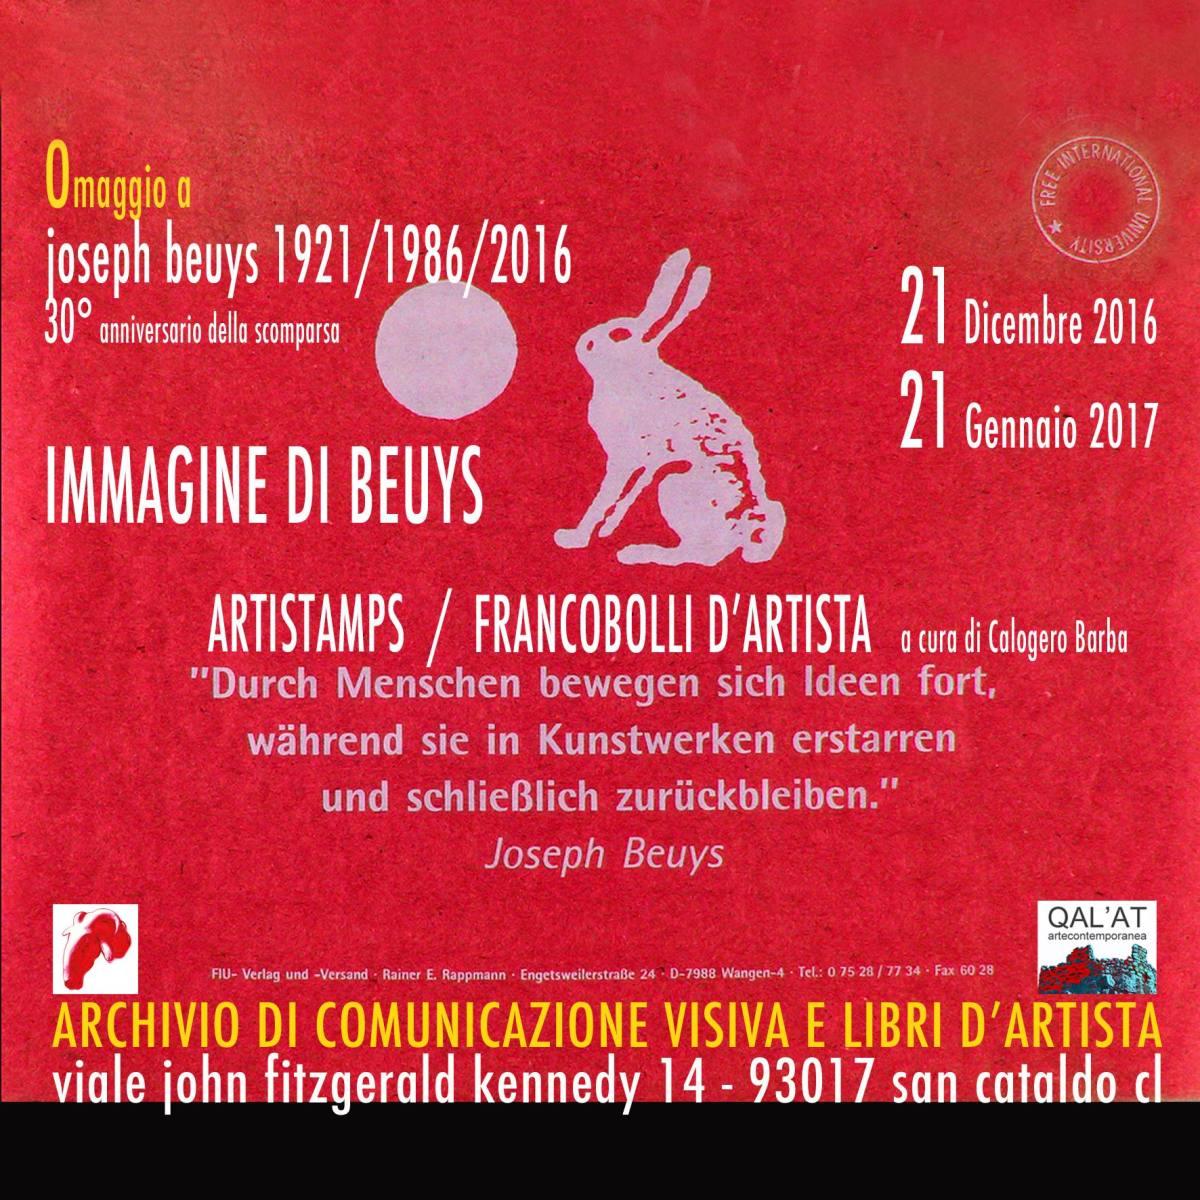 Immagine di Joseph Beuys – Artistamps/Francobolli d'Artista